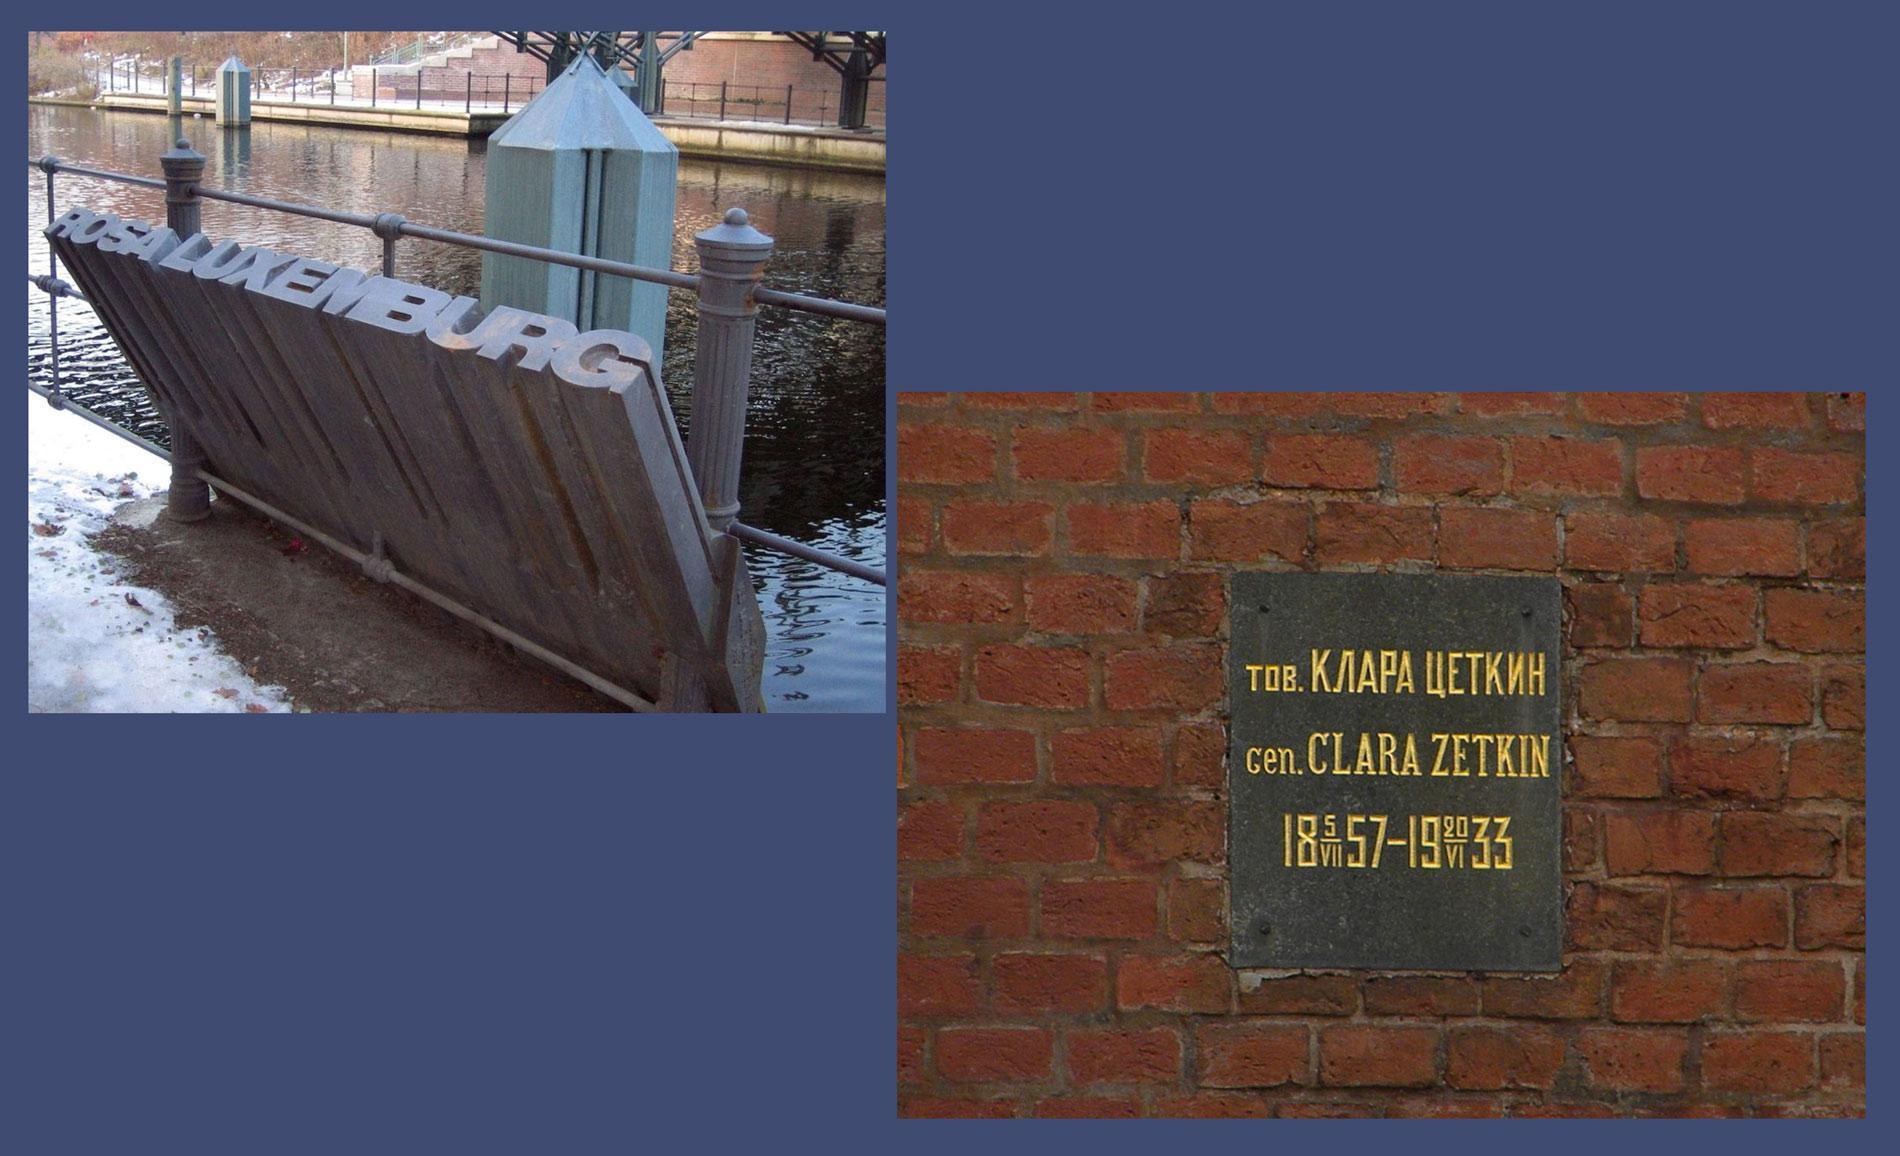 Памятник на месте убийства Розы Люксембург на Ландвер-канале в Берлине / Надгробная плита в Кремлёвской стене. Фото ©Wikipedia